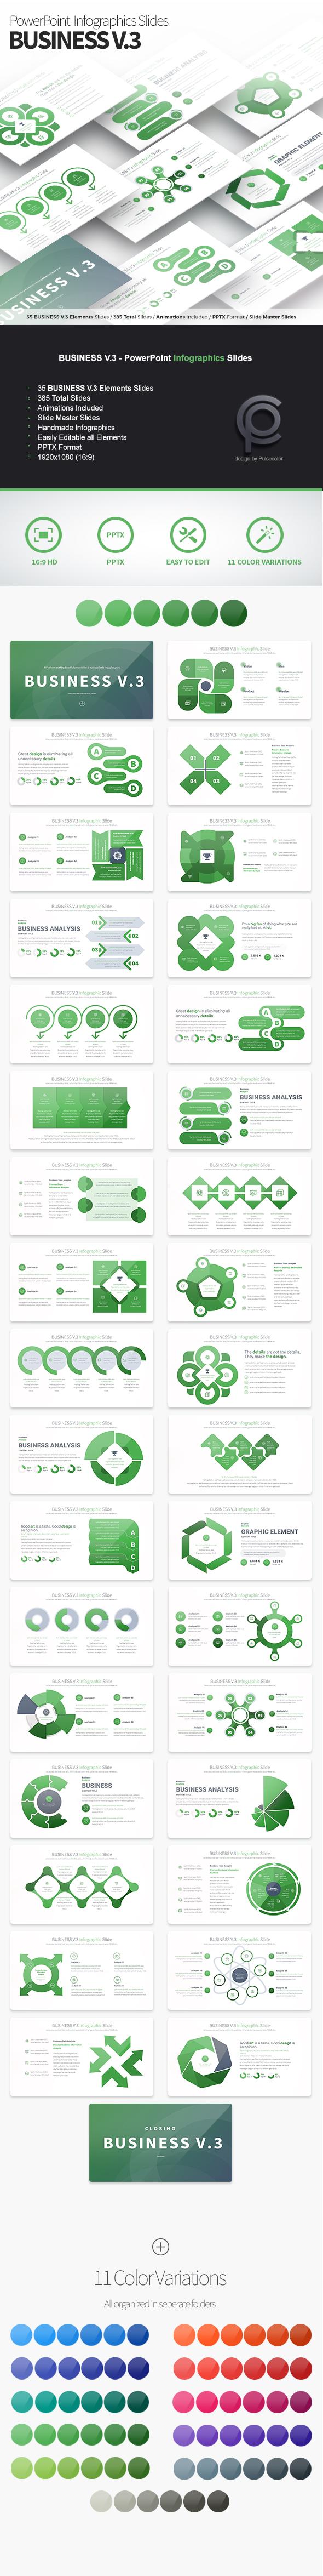 BUSINESS V.3 - PowerPoint Infographics Slides